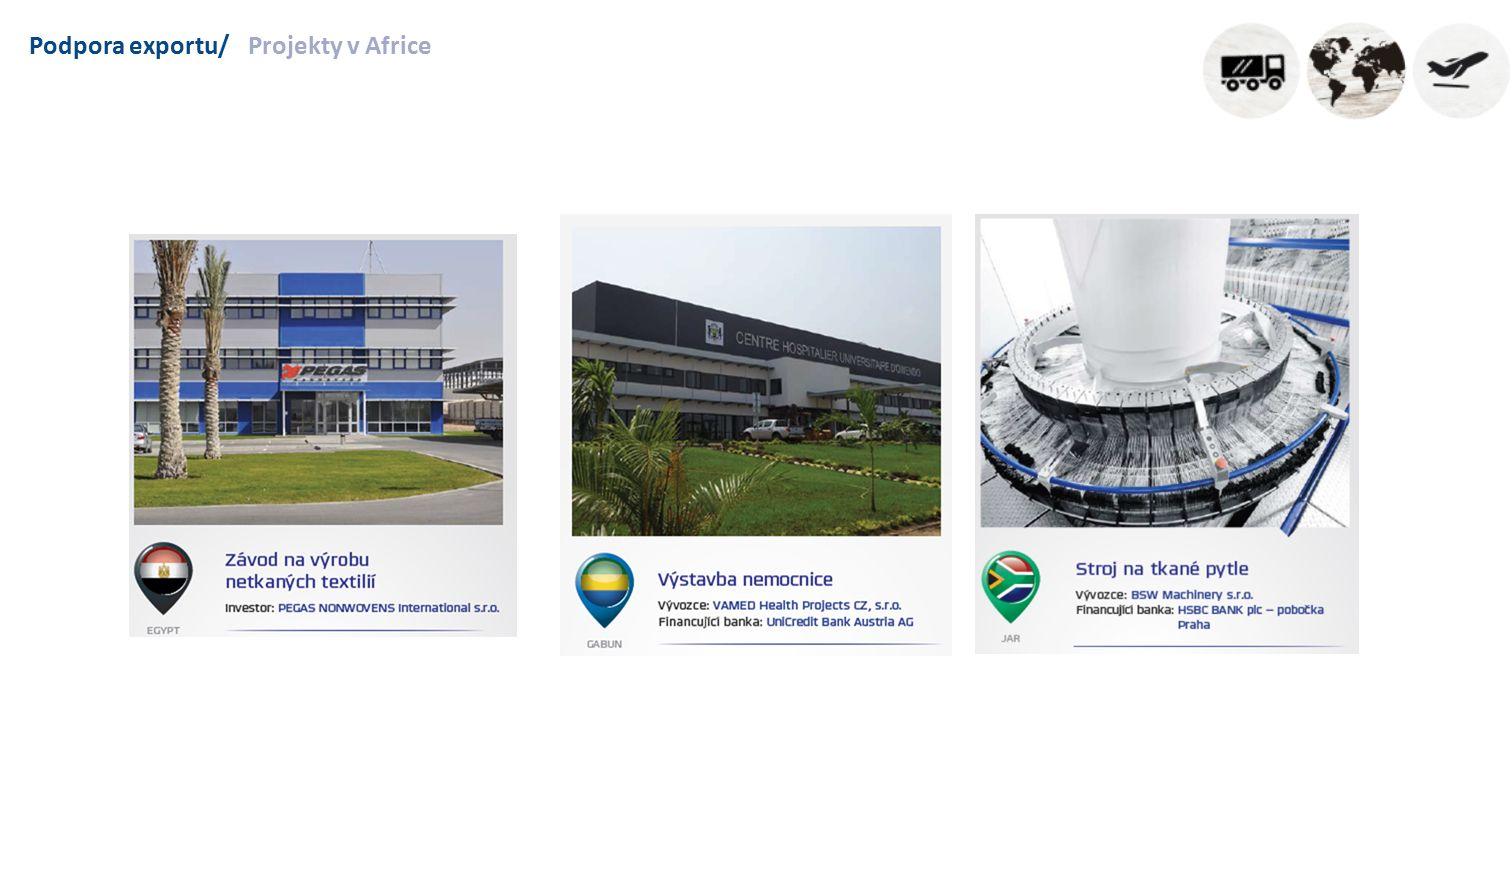 Podpora exportu/Projekty v Africe